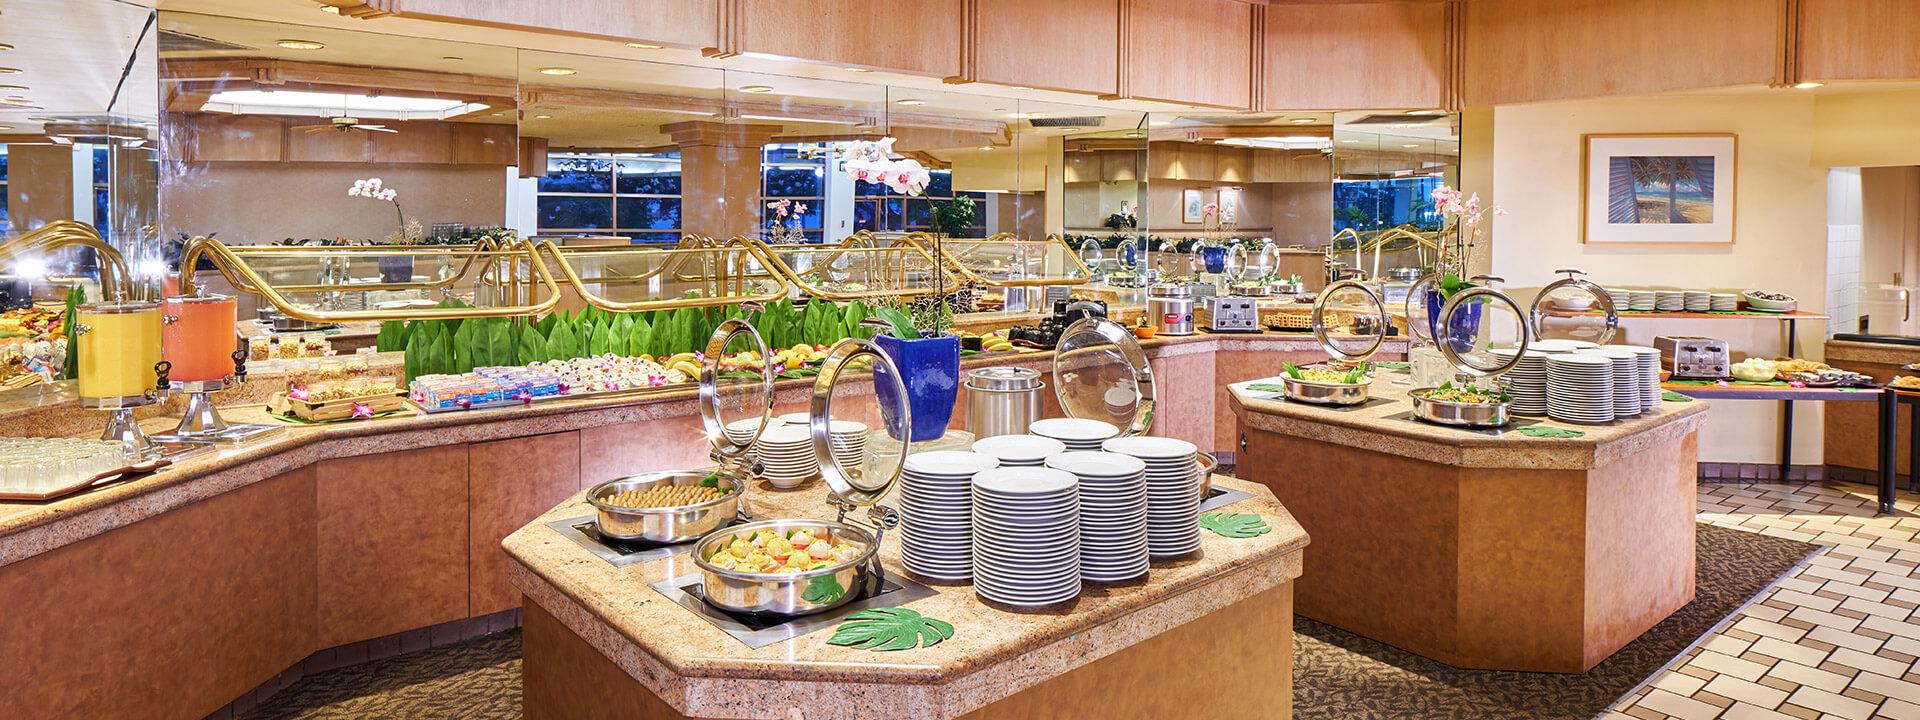 Plantation Cafe Ala Moana Hotel